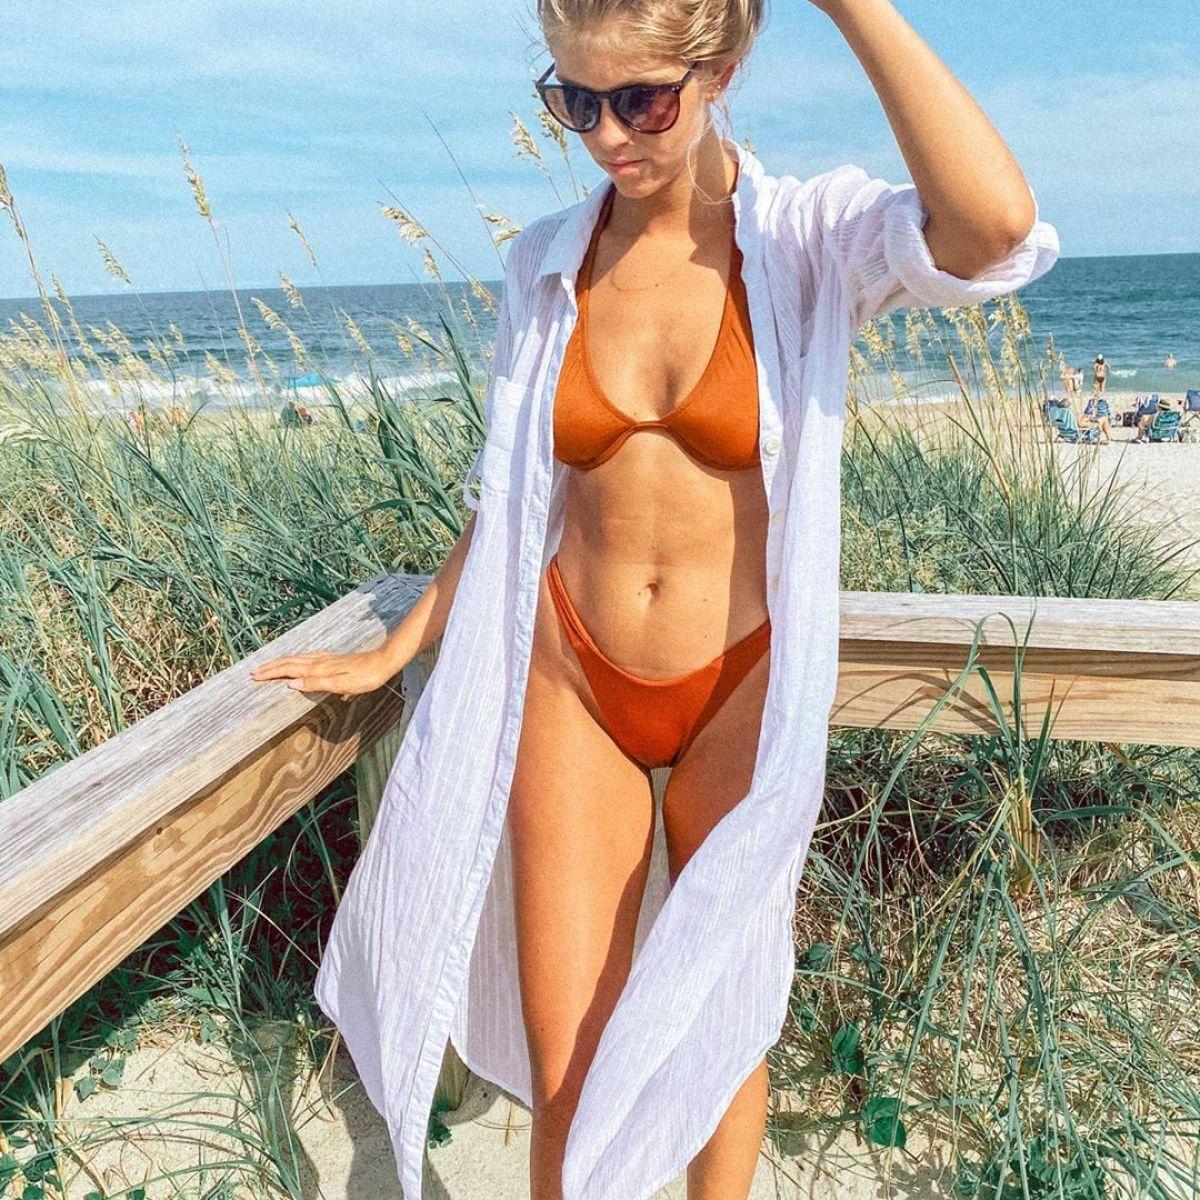 Lexi Dibenedetto Bikini Instagtram Photos